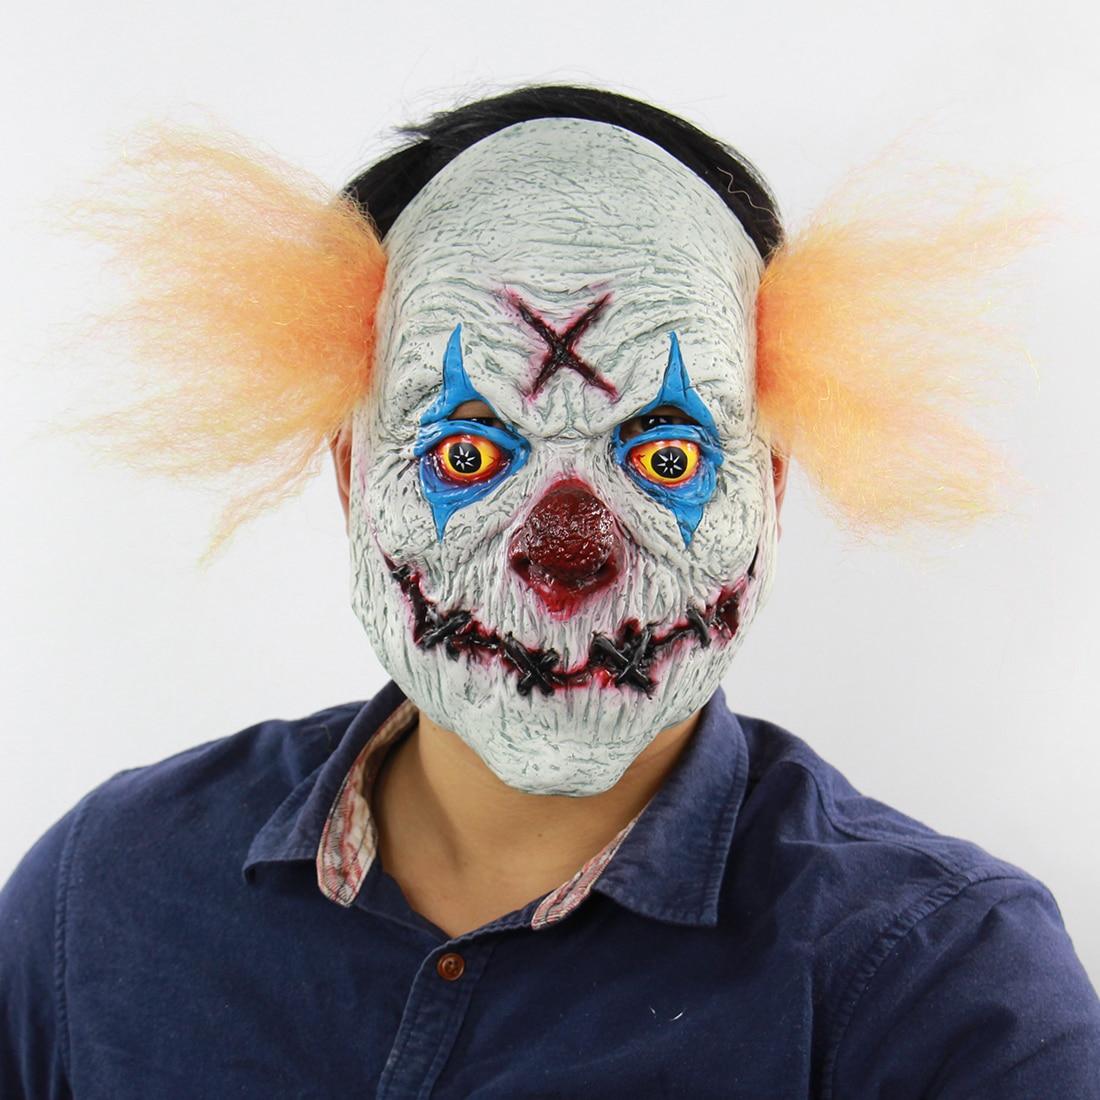 1pcs Terror Scary Maske Bloody Full Head Masks Clown Mask Halloween Horror Party Mascaras Man Festive Carnival Masque